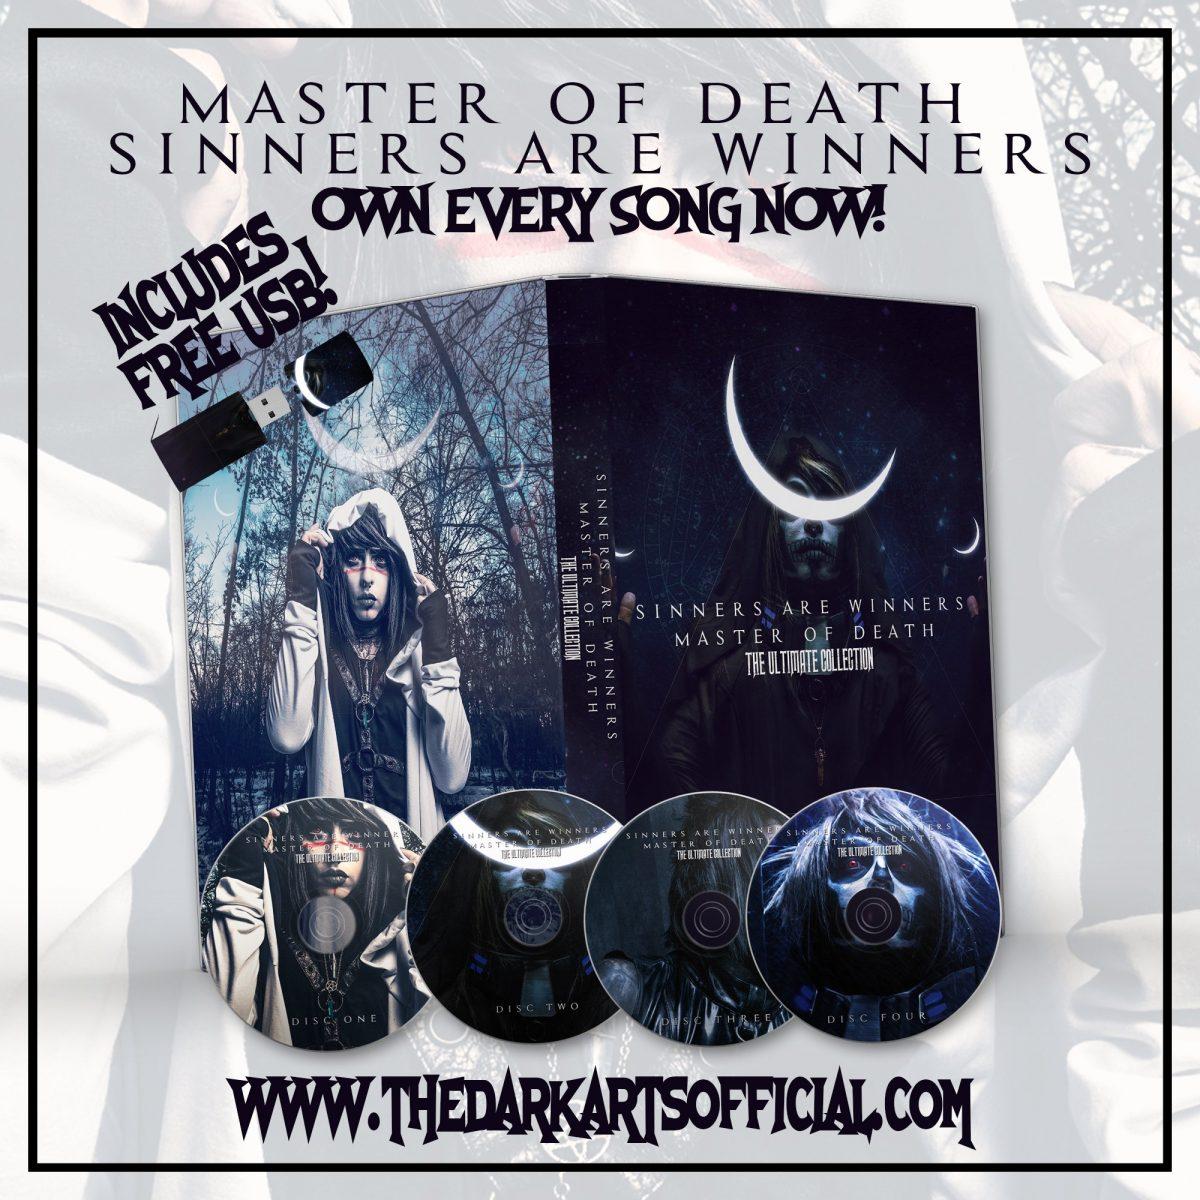 Limited Edition M.O.D. + S.A.W. Album Set! (FREE USB INCLUDED) - thedarkarts